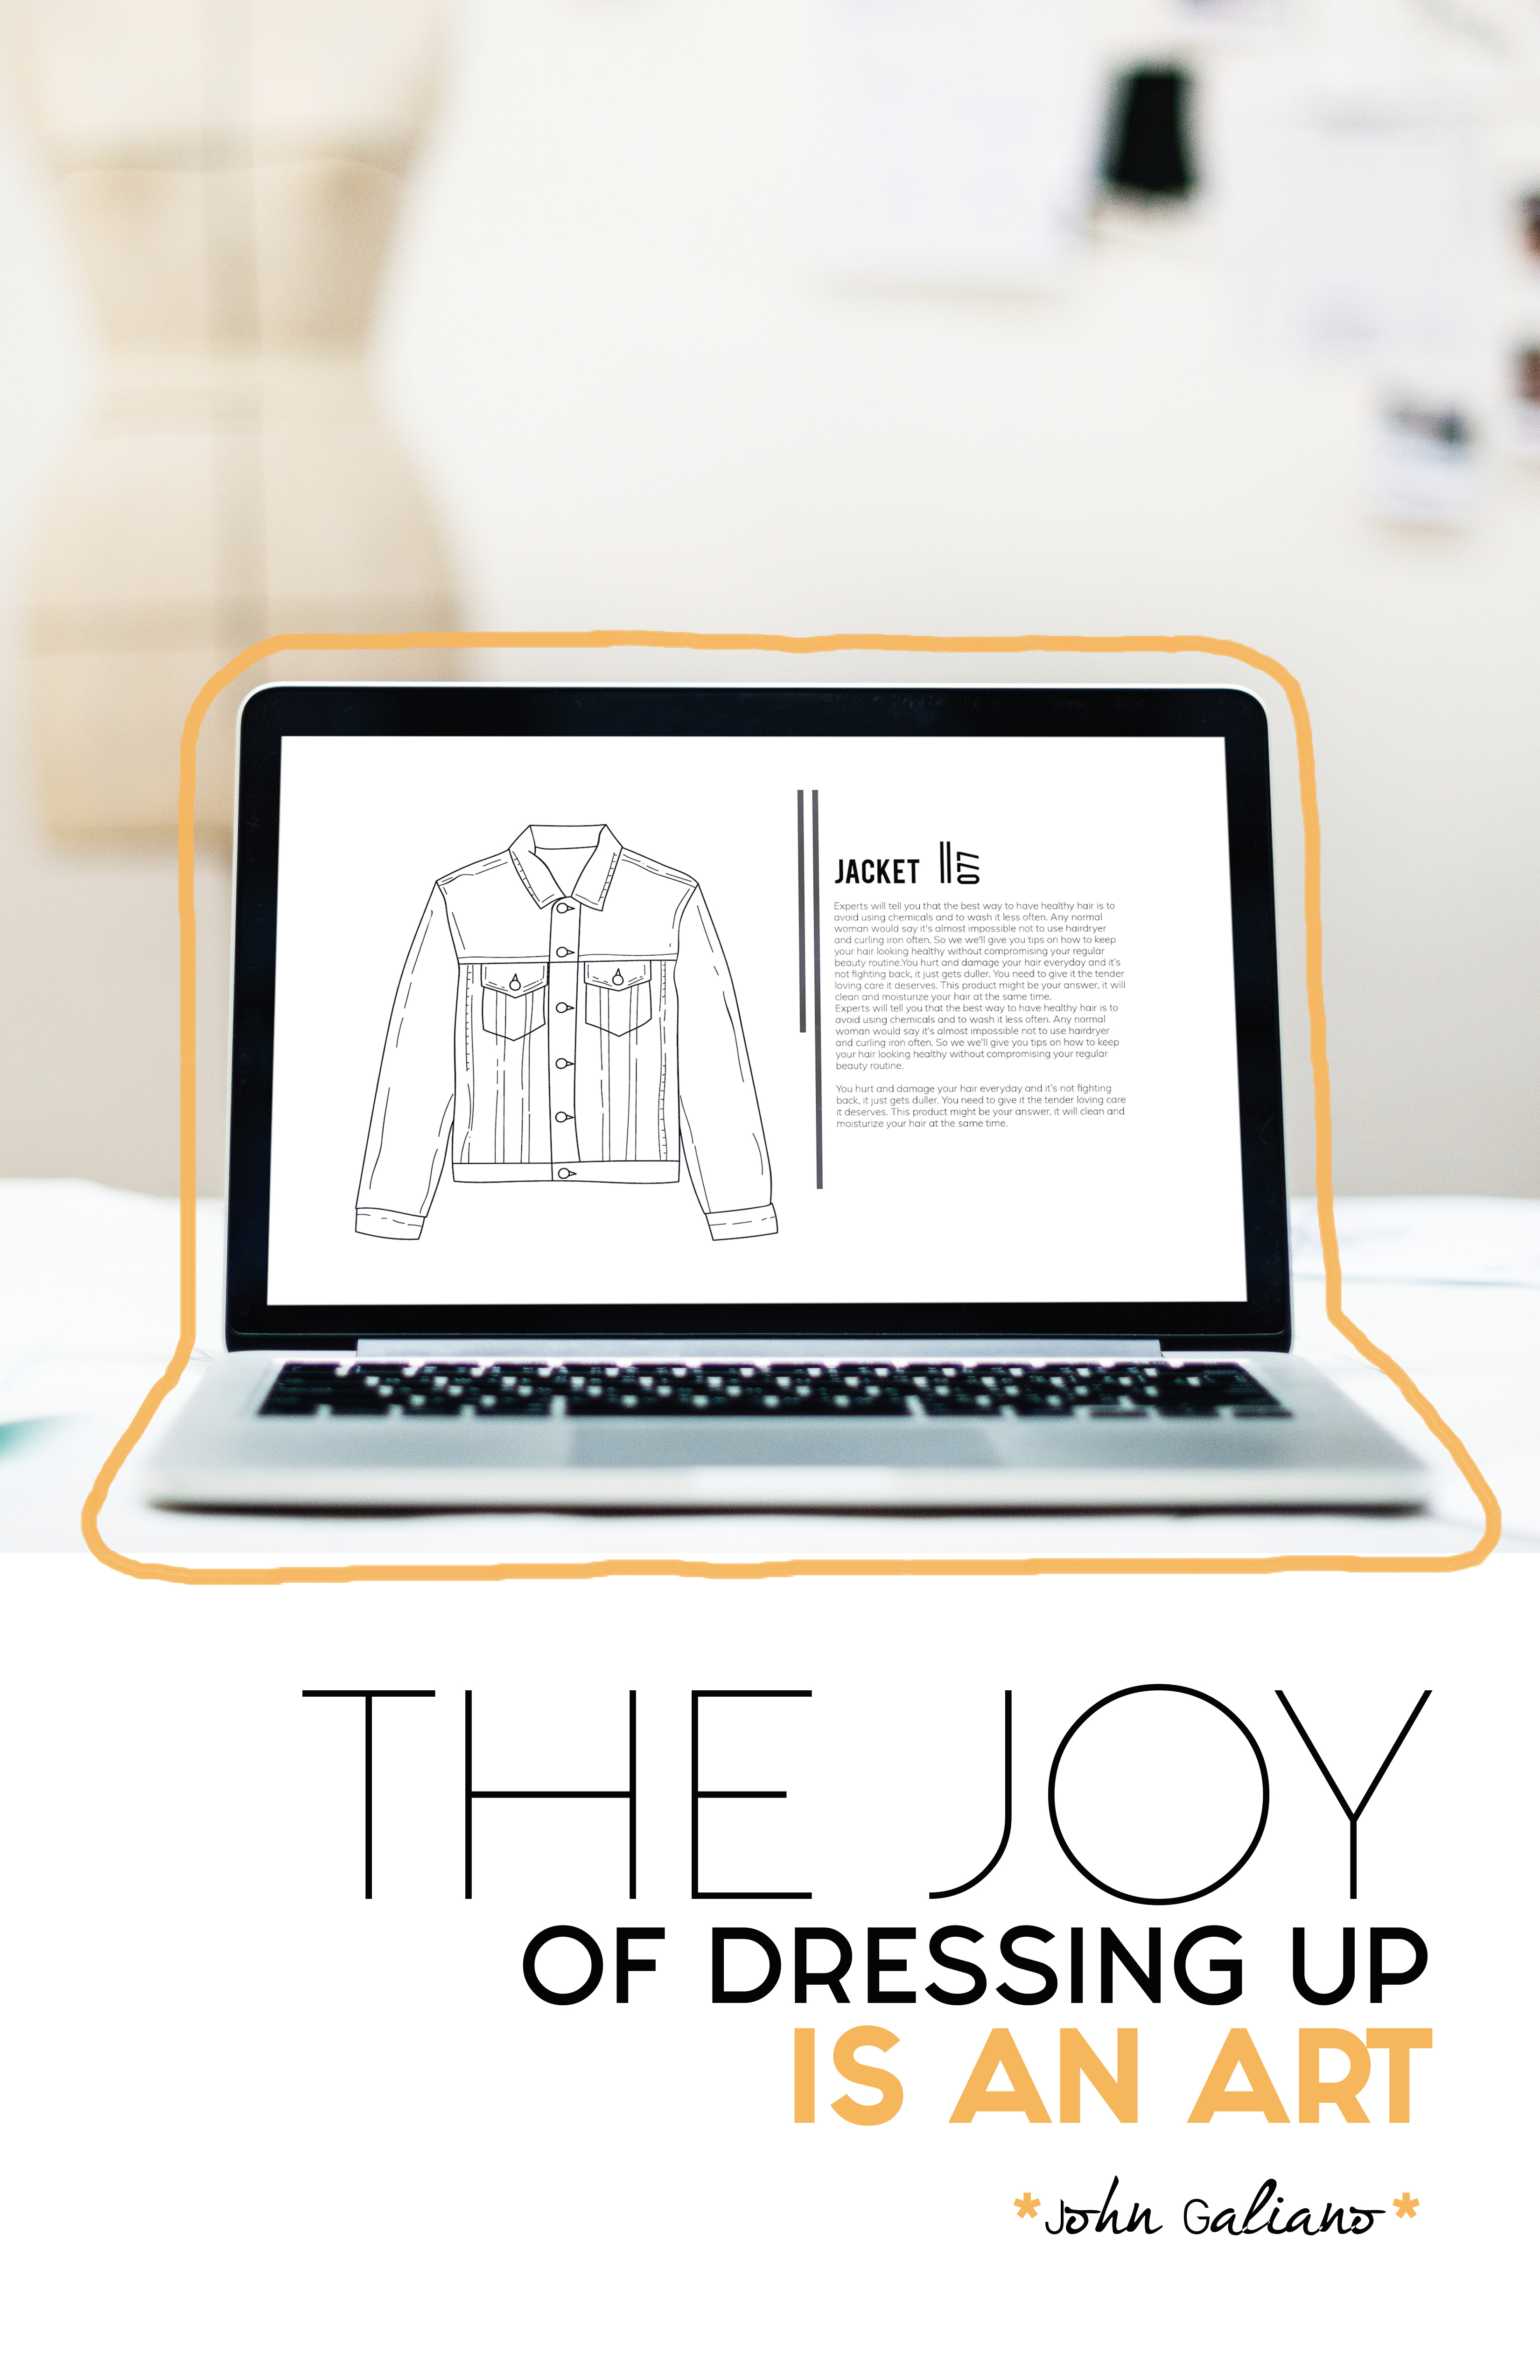 #thejoyofdressing